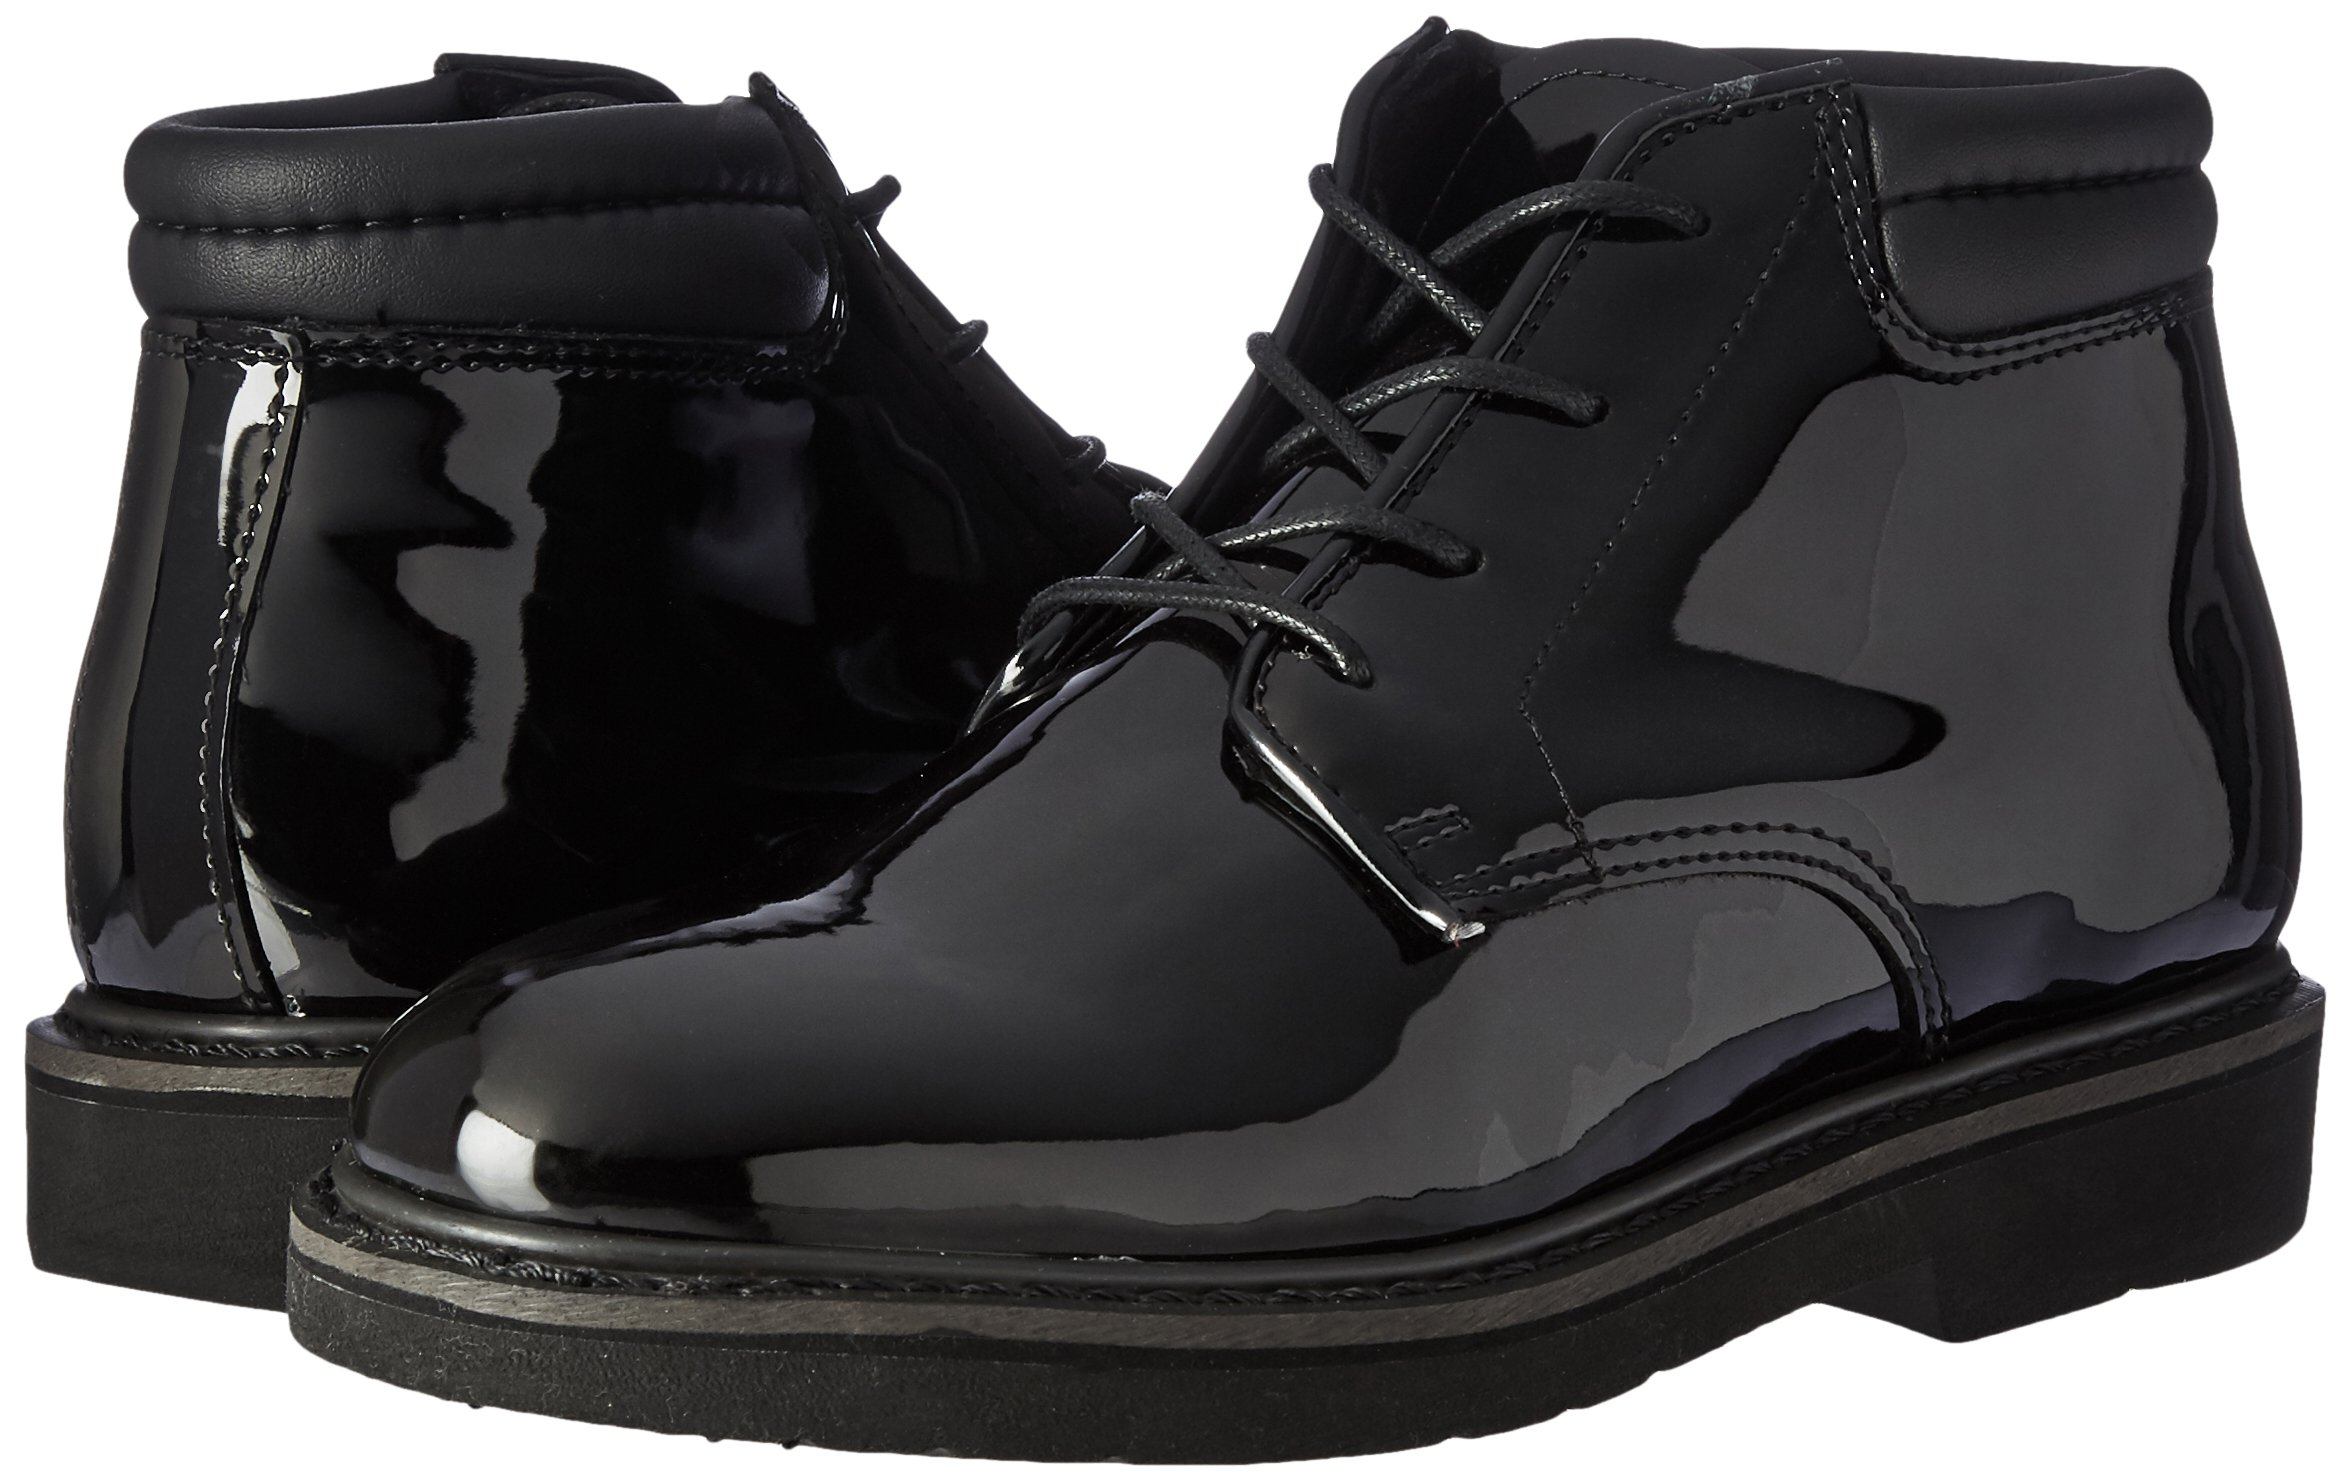 Rocky Men's 6 Inch Professional Dress 500-8 Work Boot,Black,10 XW US by Rocky (Image #6)